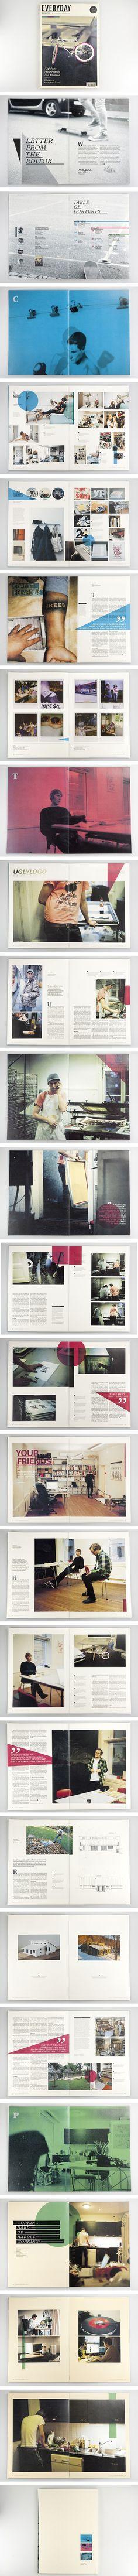 Everyday Magazine : Mikael Fløysand